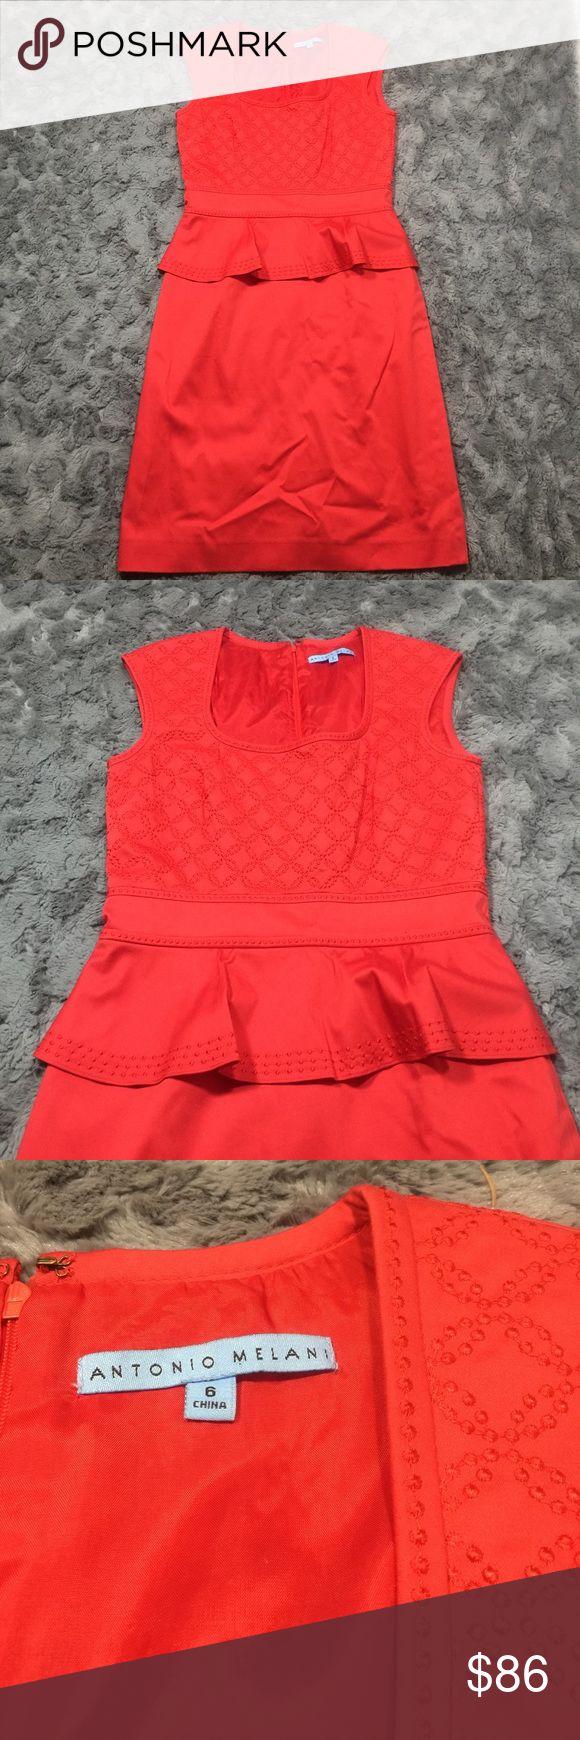 Antonio Melani Red Peplum Dress Red Peplum dress with beautiful embroidered bodice detail ANTONIO MELANI Dresses Midi